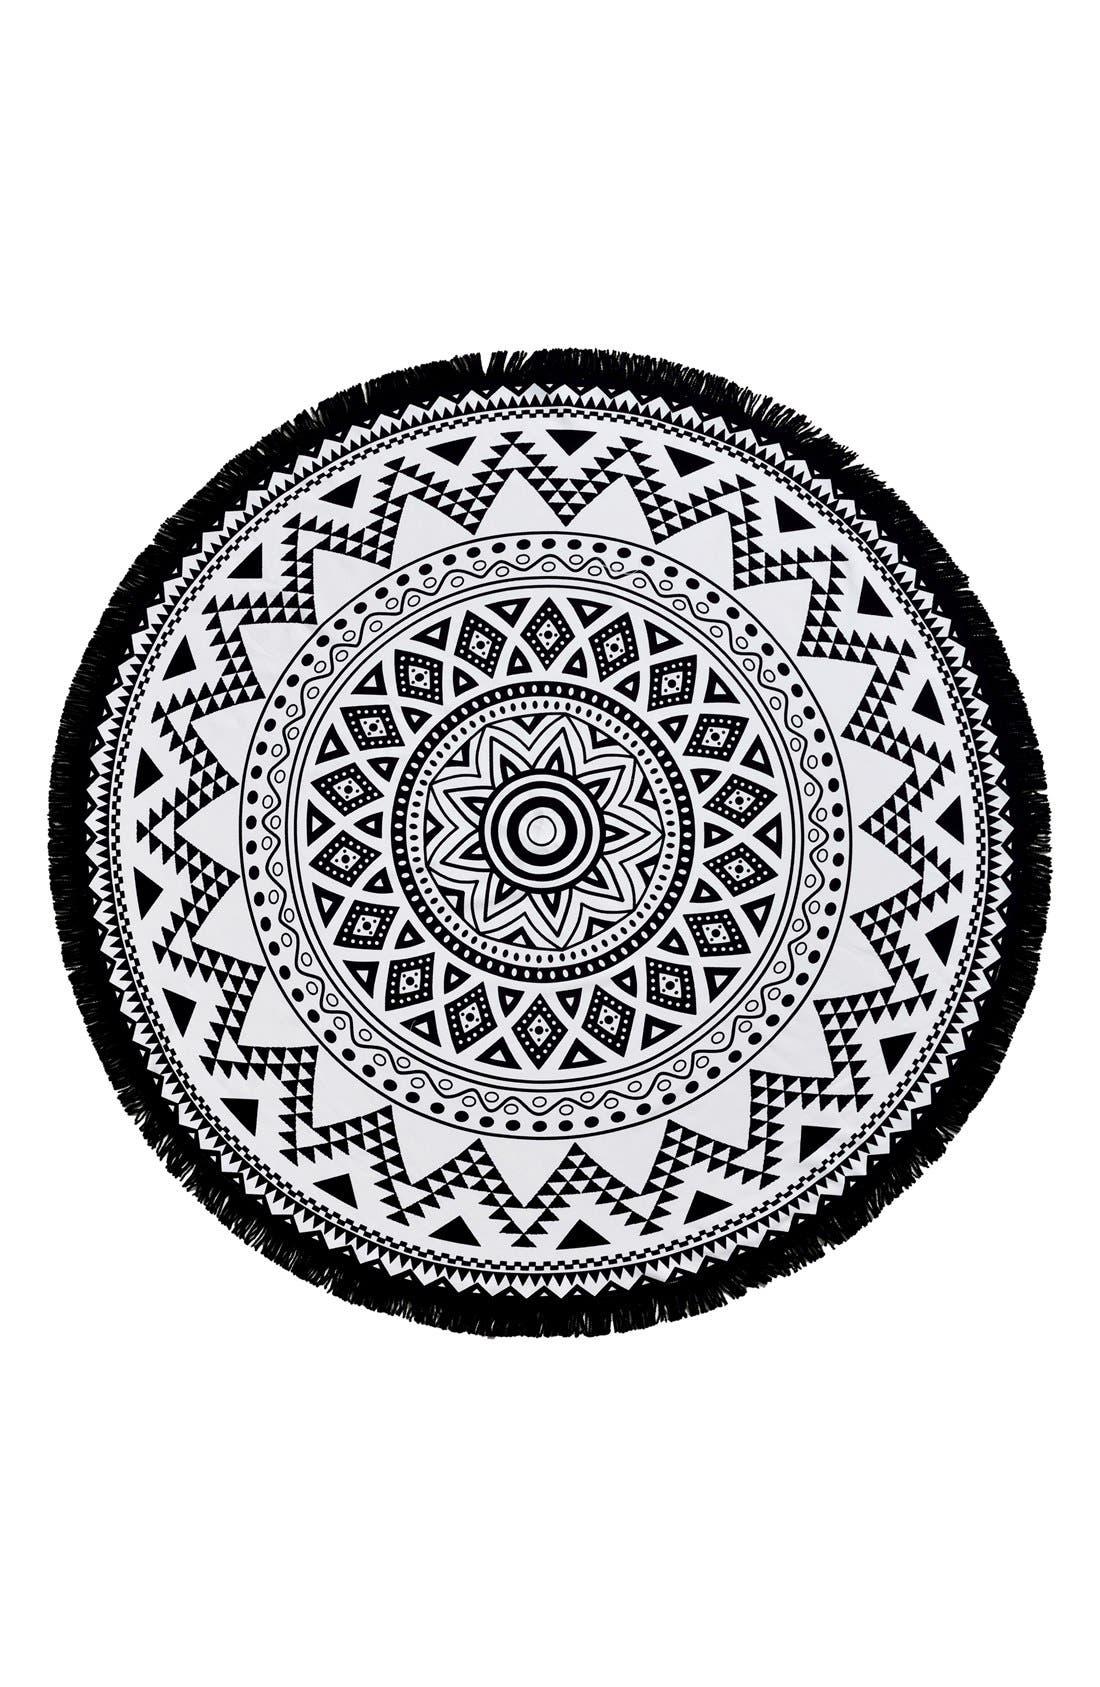 Main Image - Linum Home Textiles 'Kilim' Turkish Pestemal Round Beach Towel